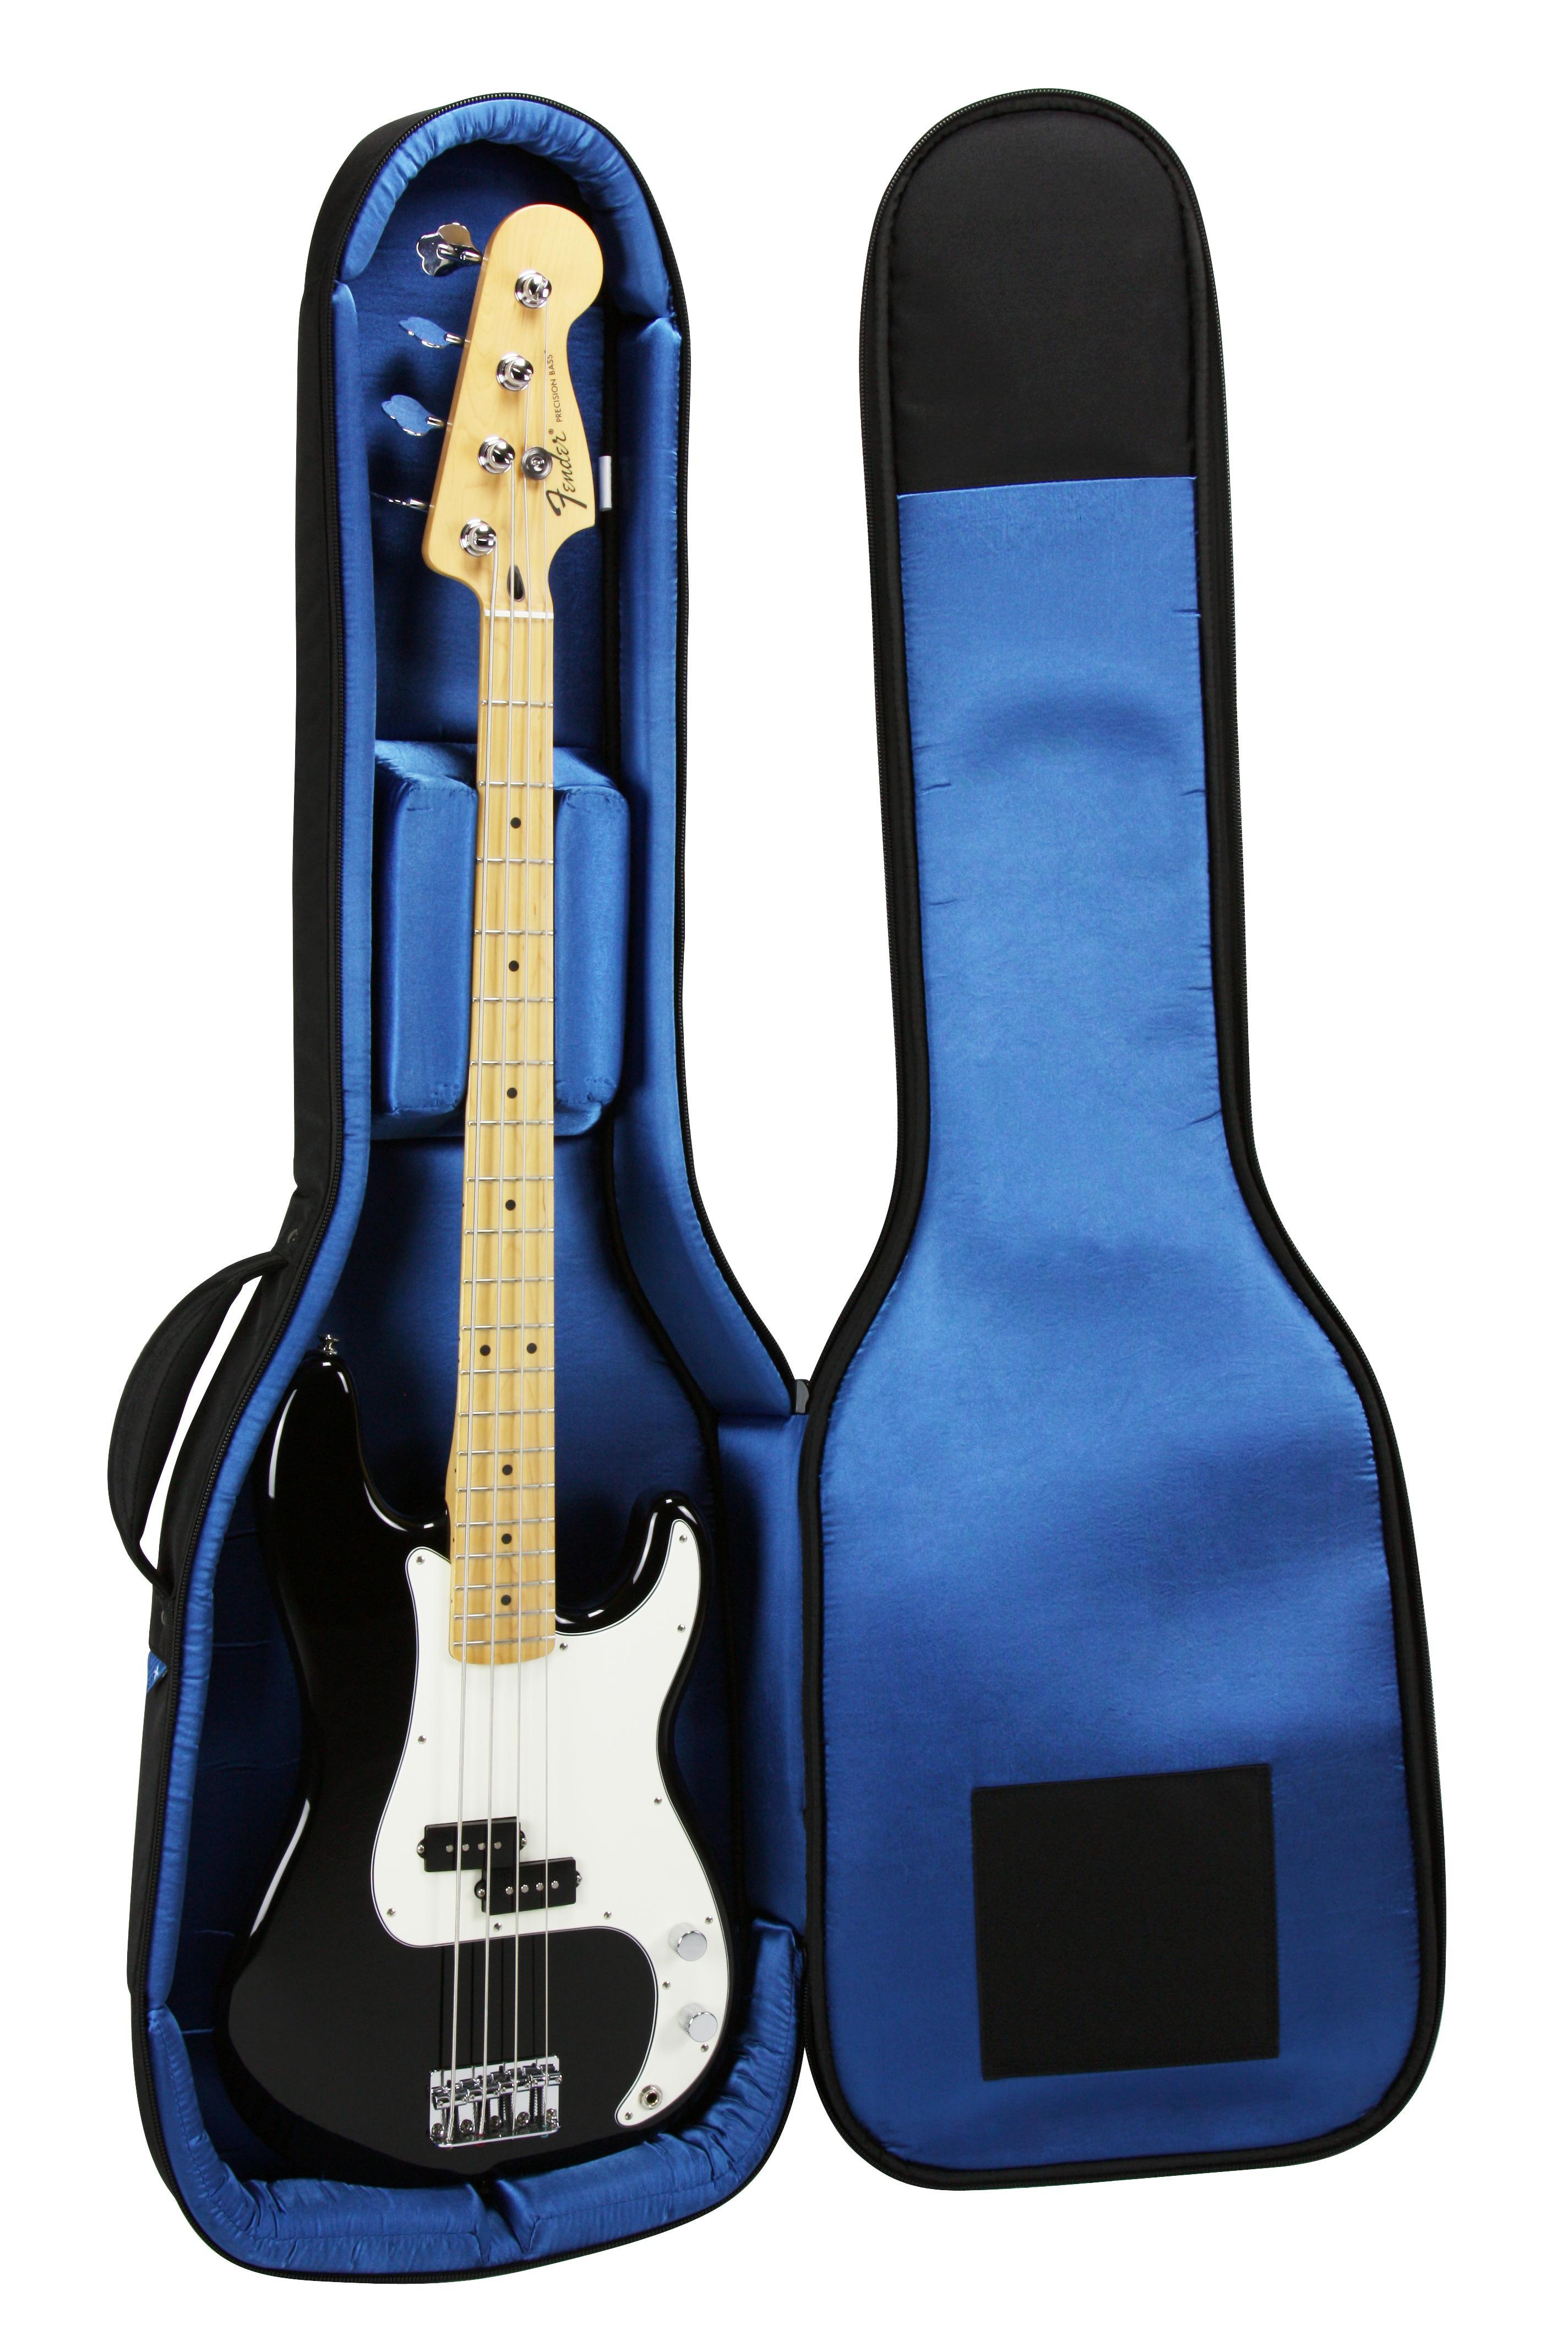 reunion blues rbxb4 electric bass bag musical instruments. Black Bedroom Furniture Sets. Home Design Ideas